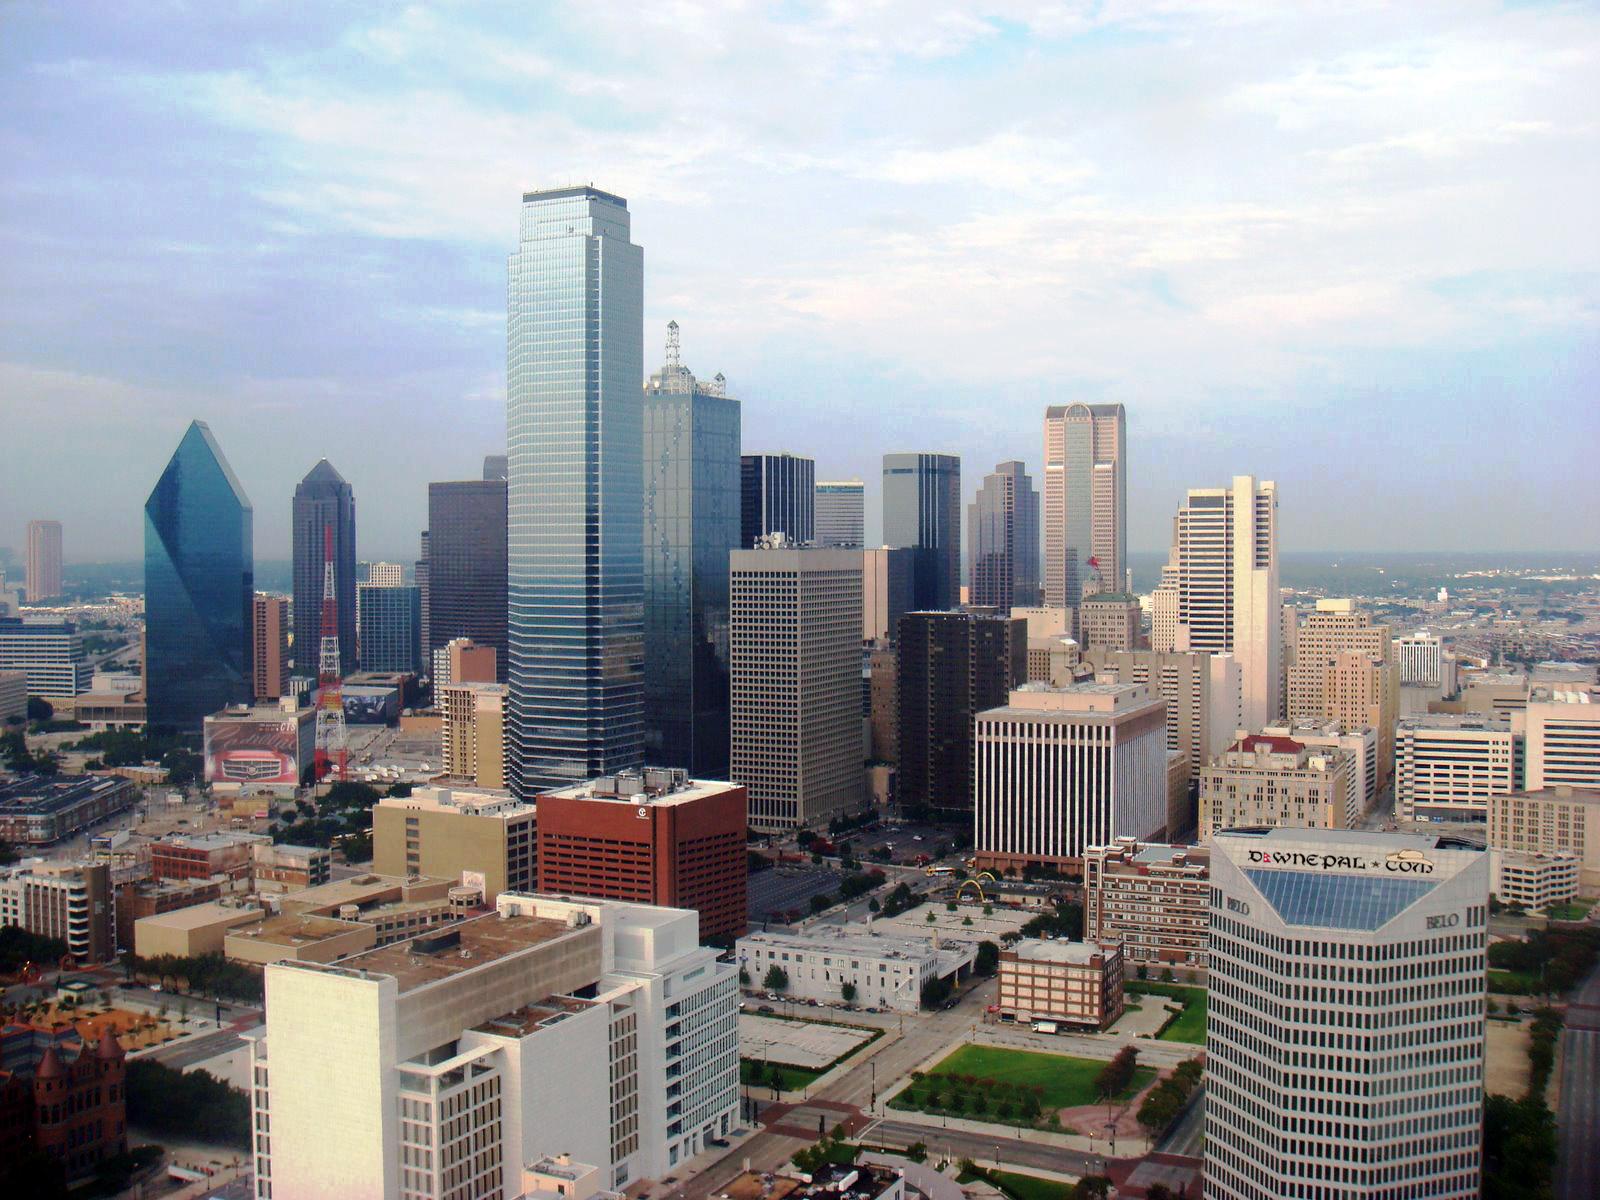 dallas texas wallpaper hd - photo #20